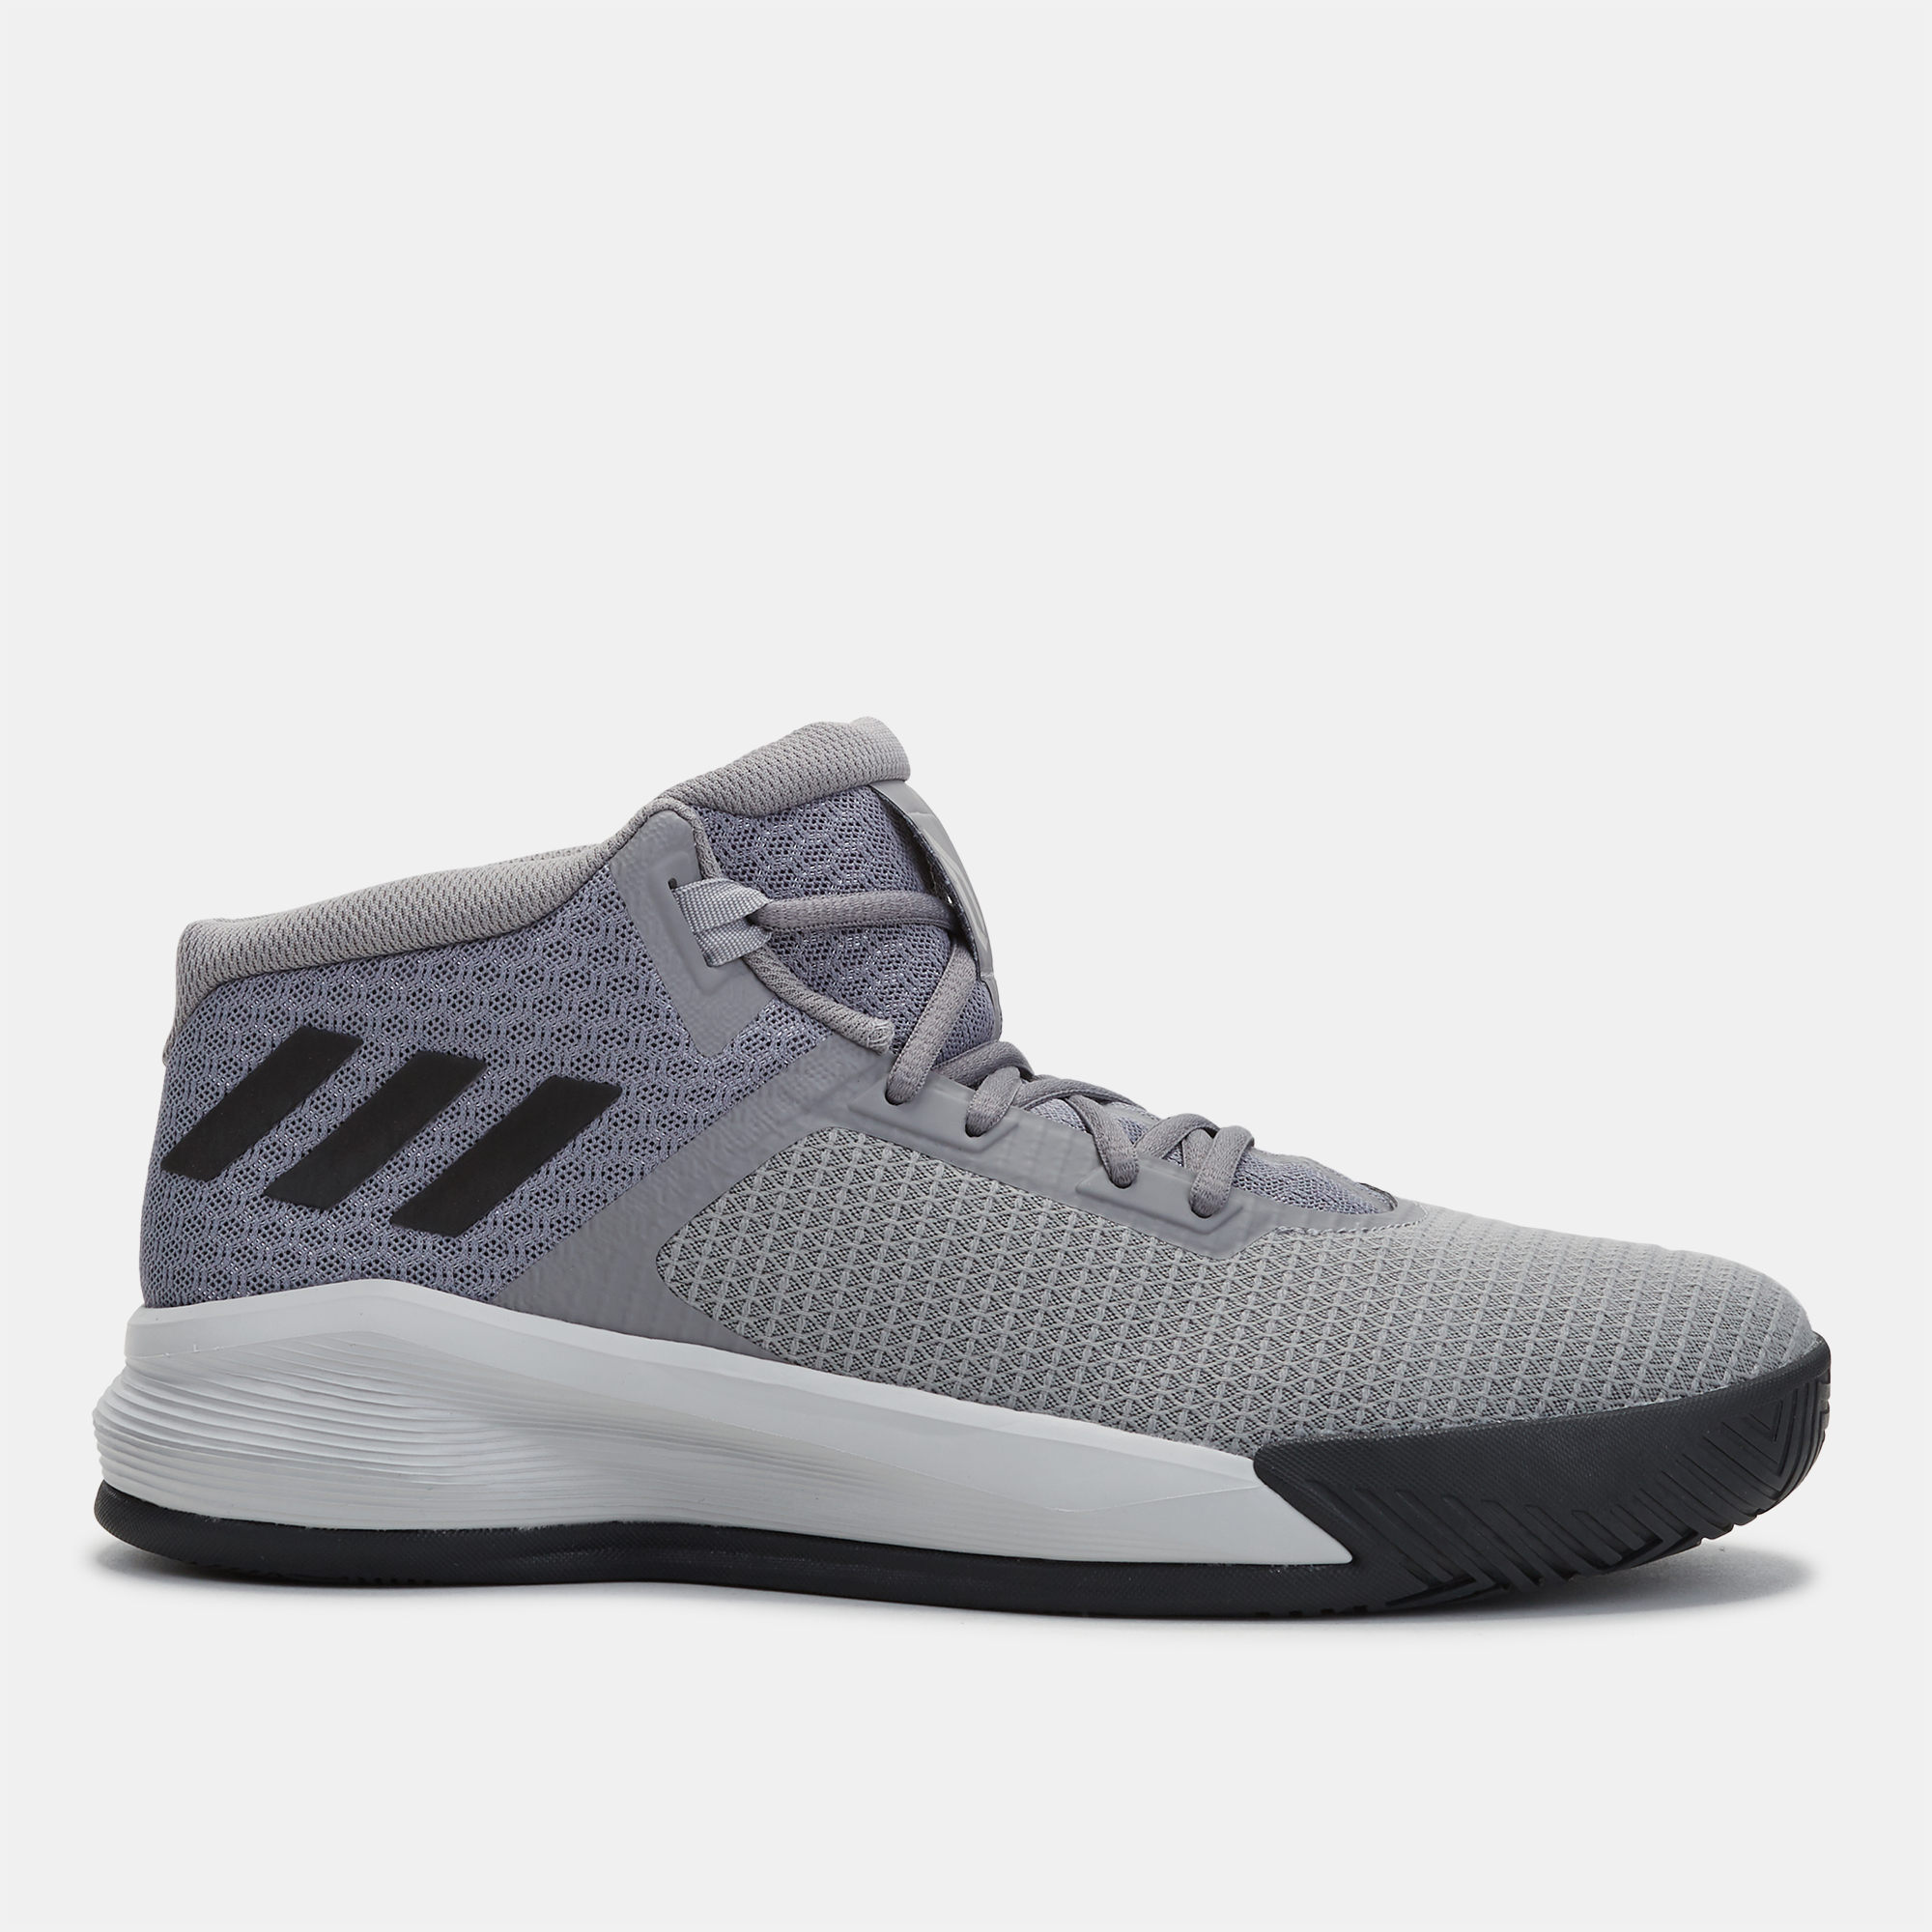 eb3d79fbc حذاء داميان ليلارد بروكفيلد من اديداس | احذية كرة السلة | تخفيضات الاحذية  للرجال | تخفيضات للرجال | تخفيضات | سن أند ساند سبورتس